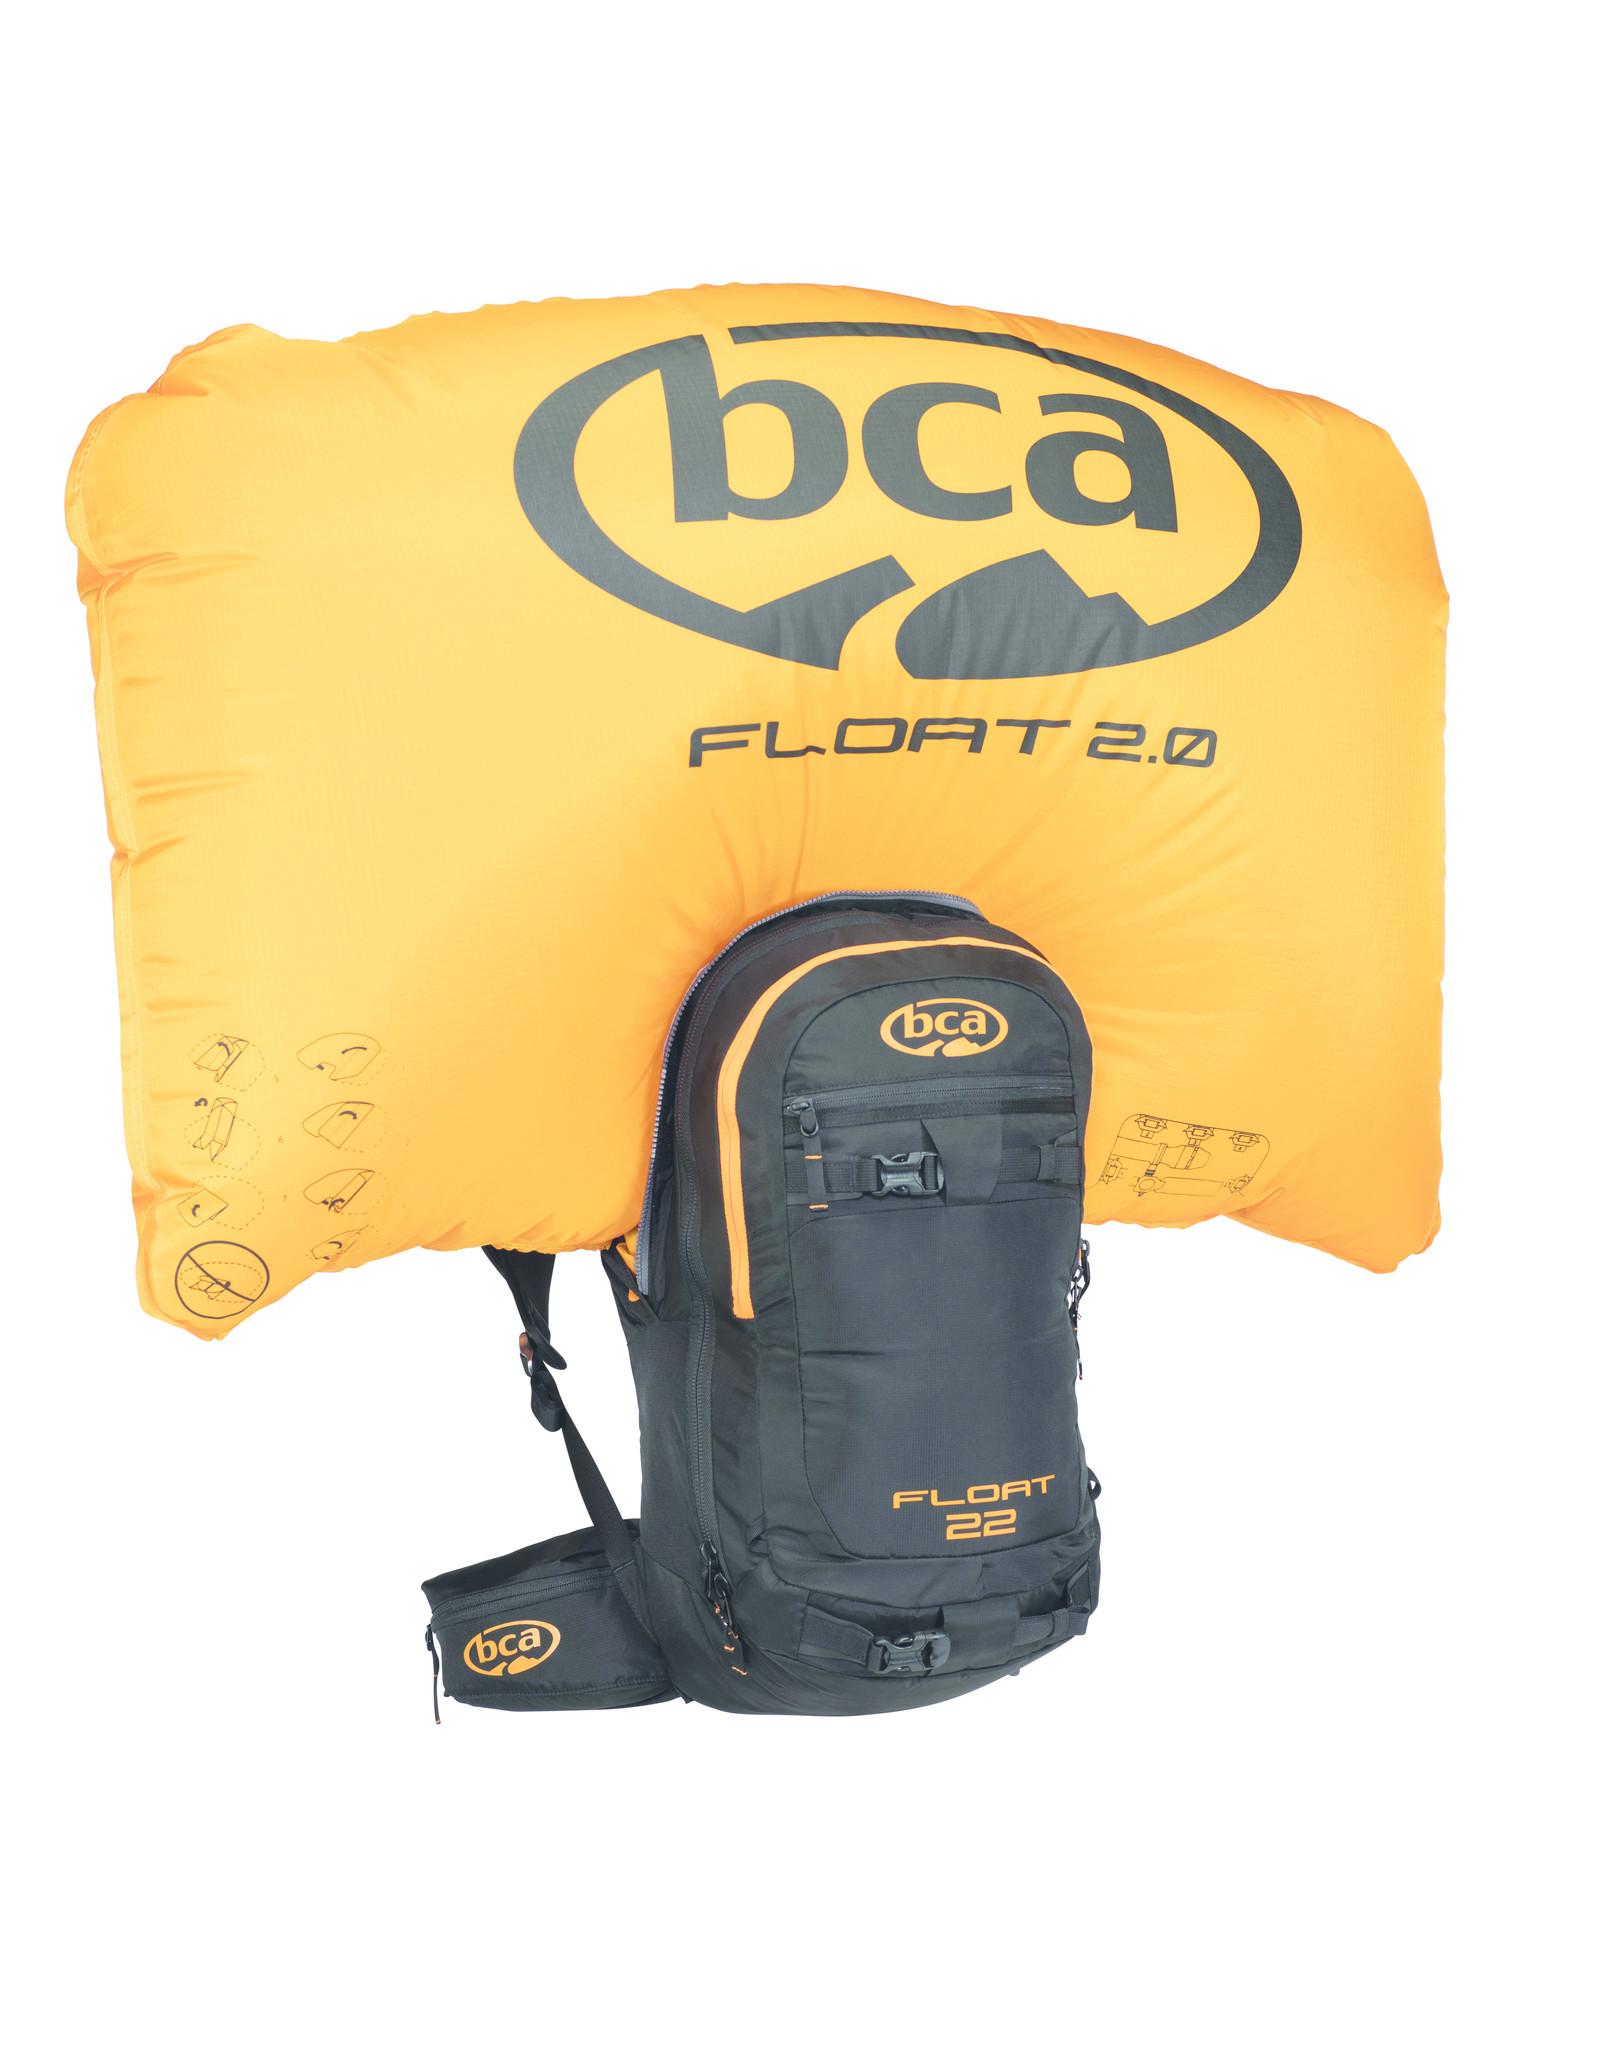 BCA BCA FLOAT 22 AVALANCHE AIRBAG 2.0